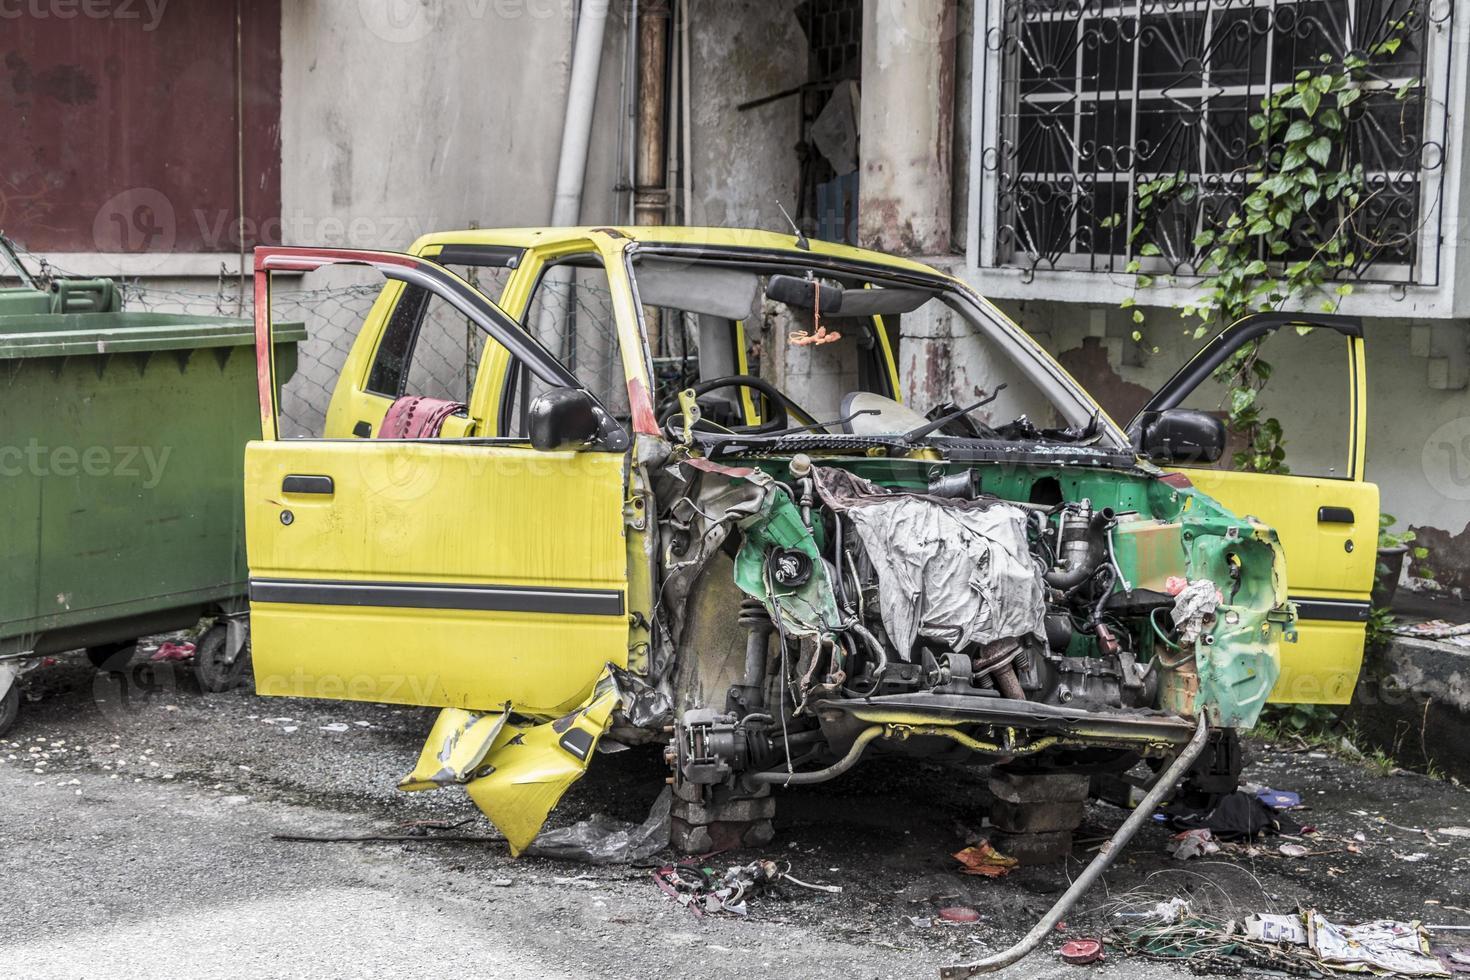 Broken accident car in a housing development in Kuala Lumpur. photo